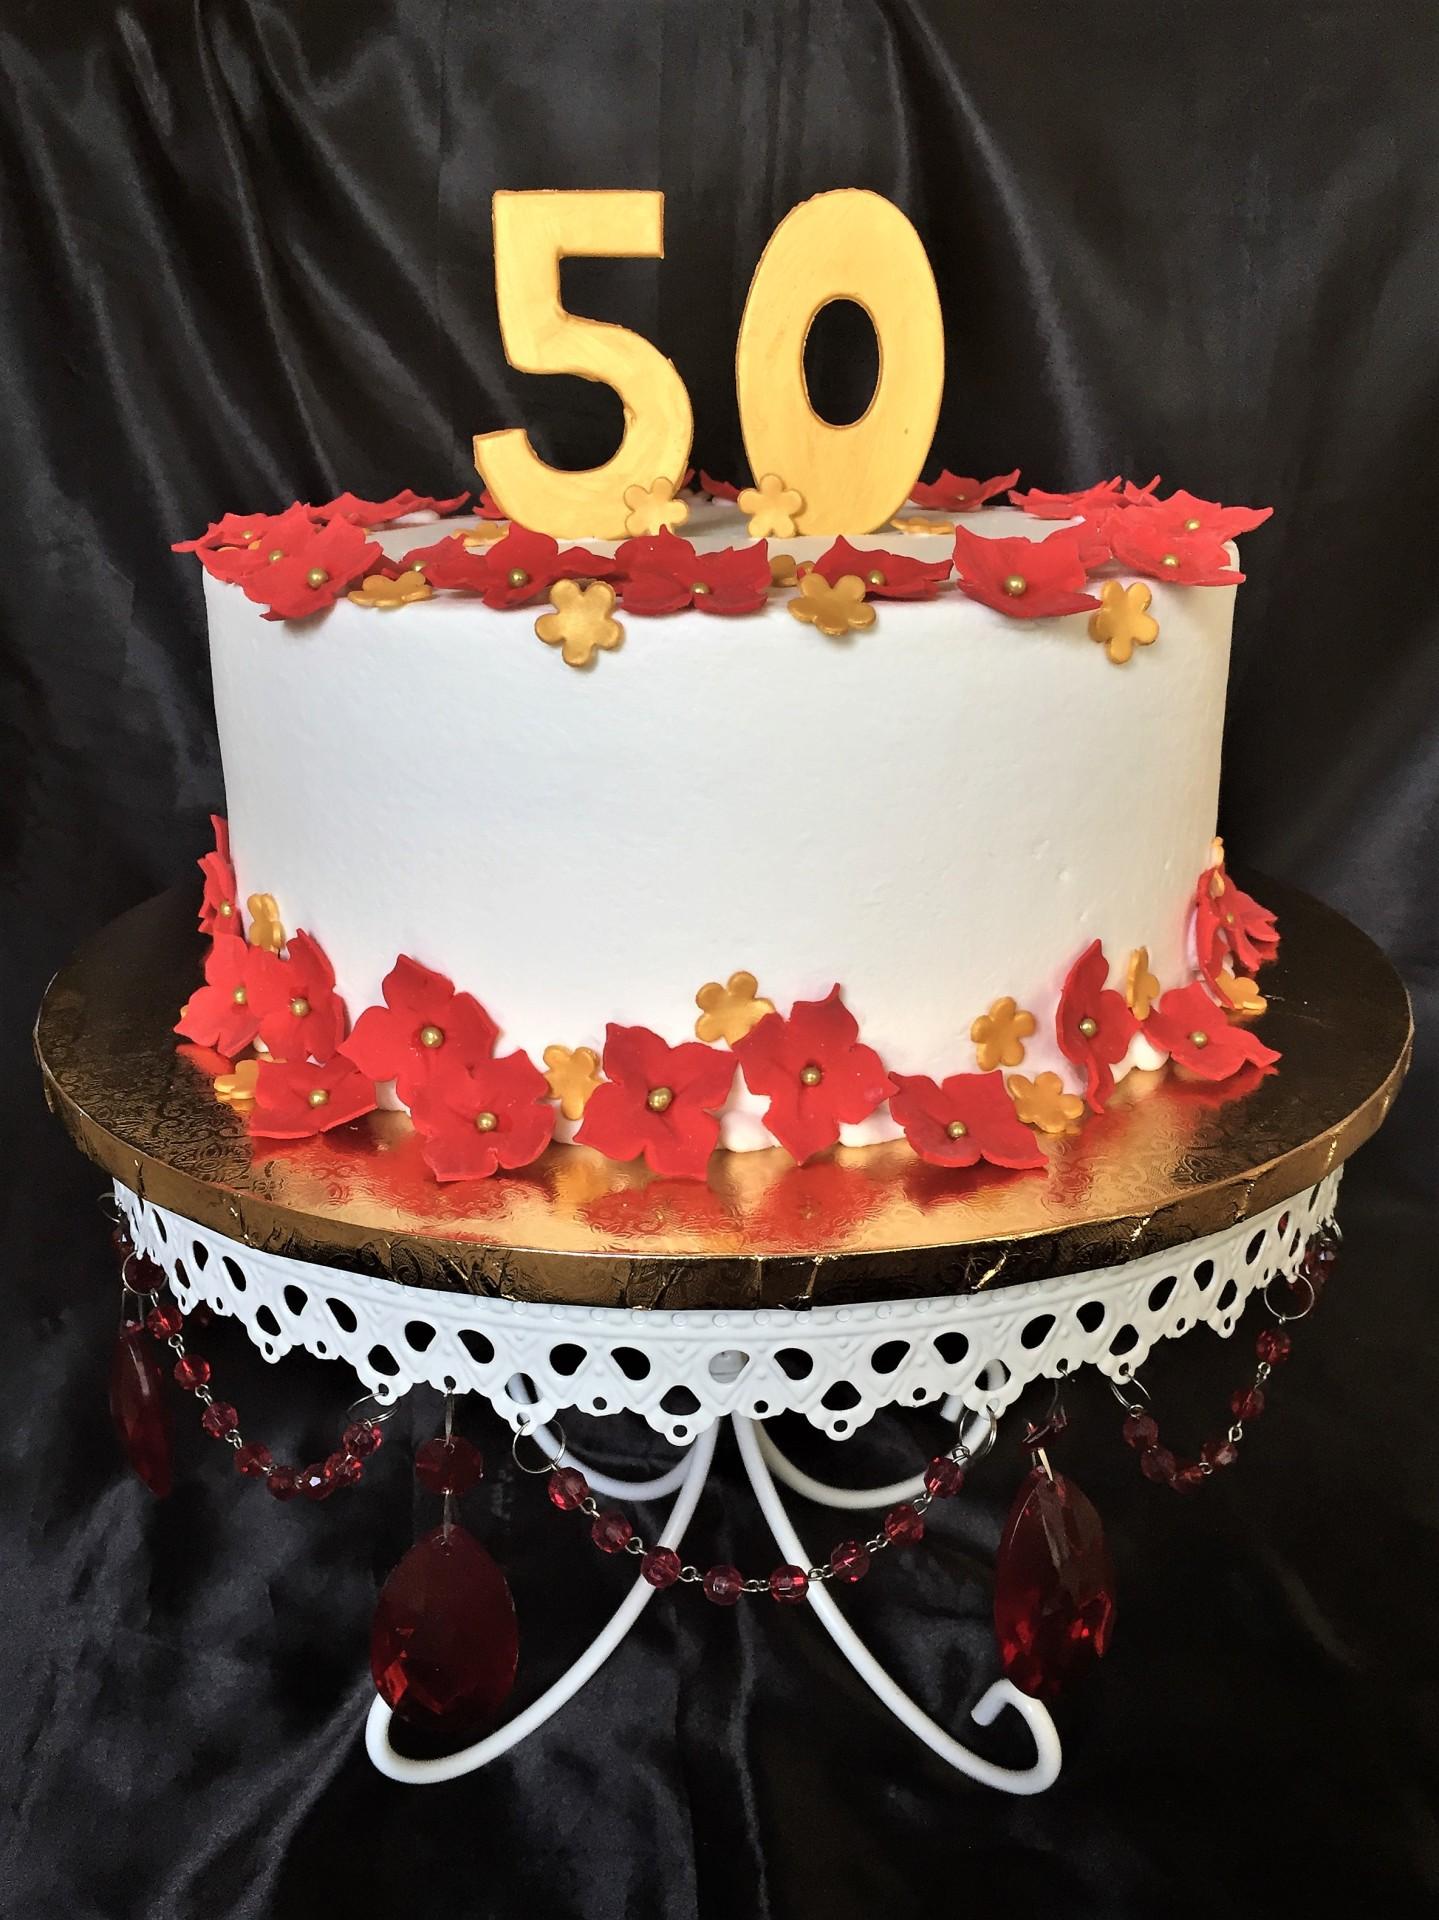 5oth with red hydrangeas